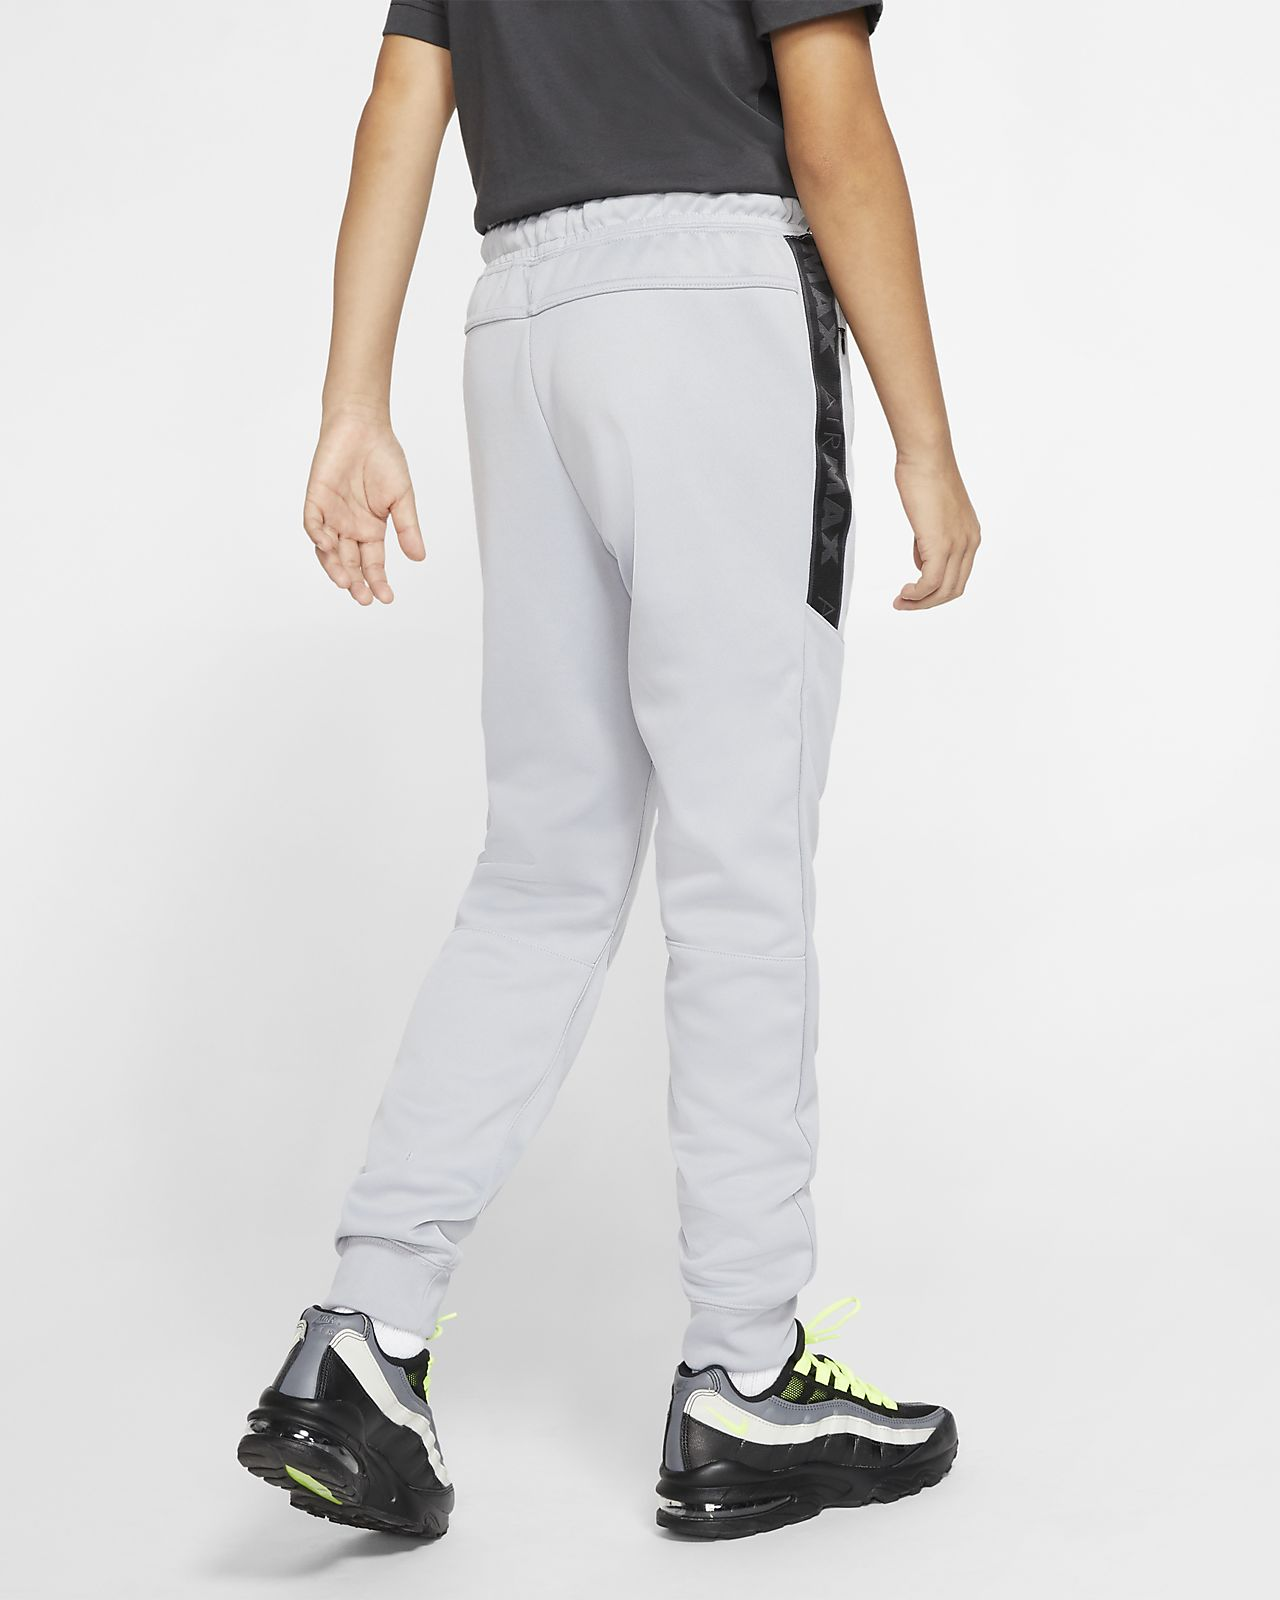 Sneakers Uomo | Nike Air Force 1 '07 Rosso > O'Pazzariello